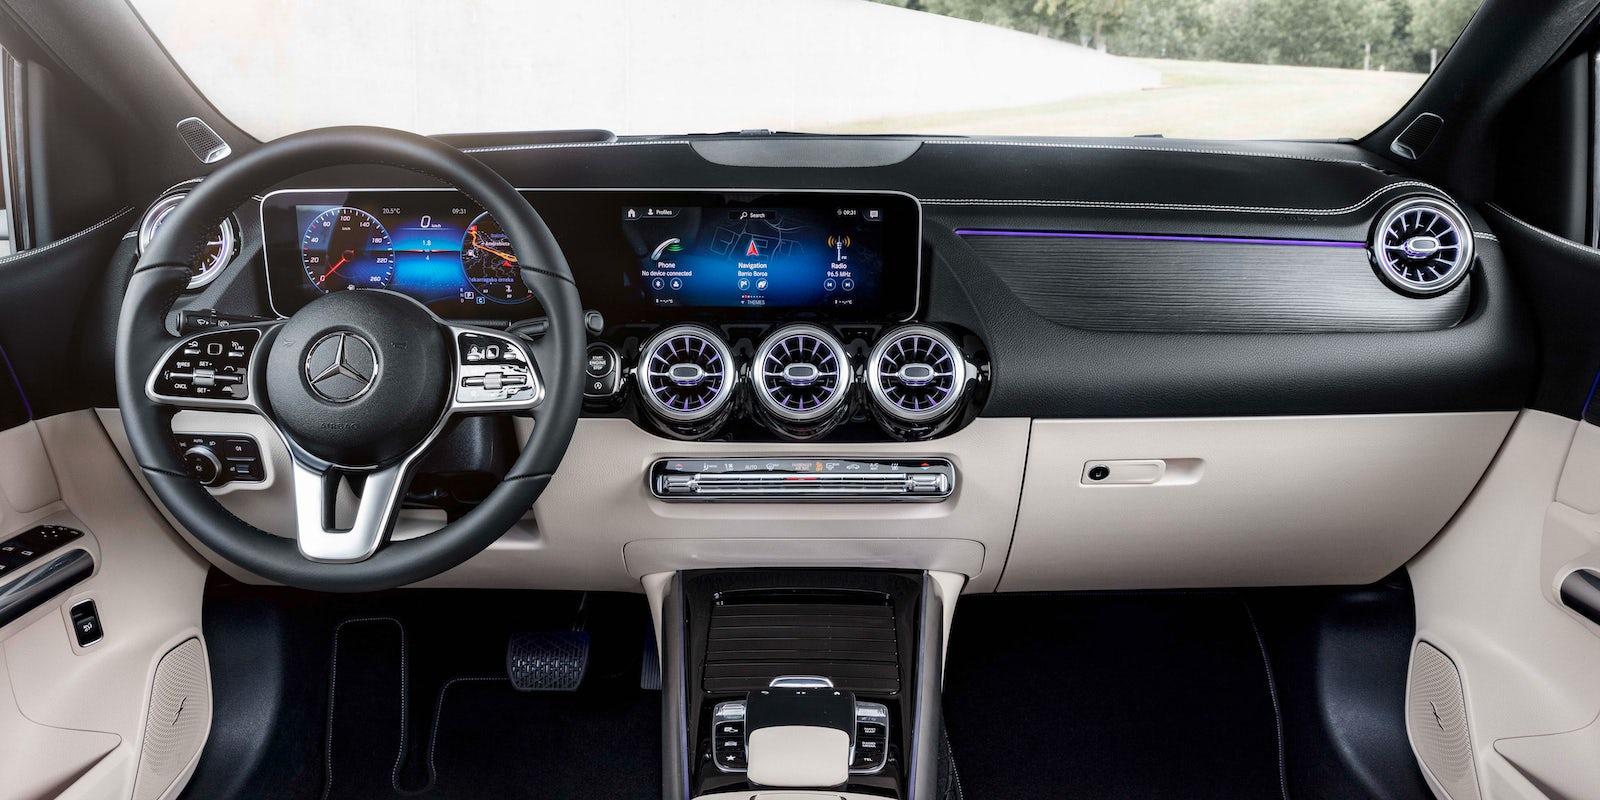 Mercedes B-Class Interior & Infotainment | carwow